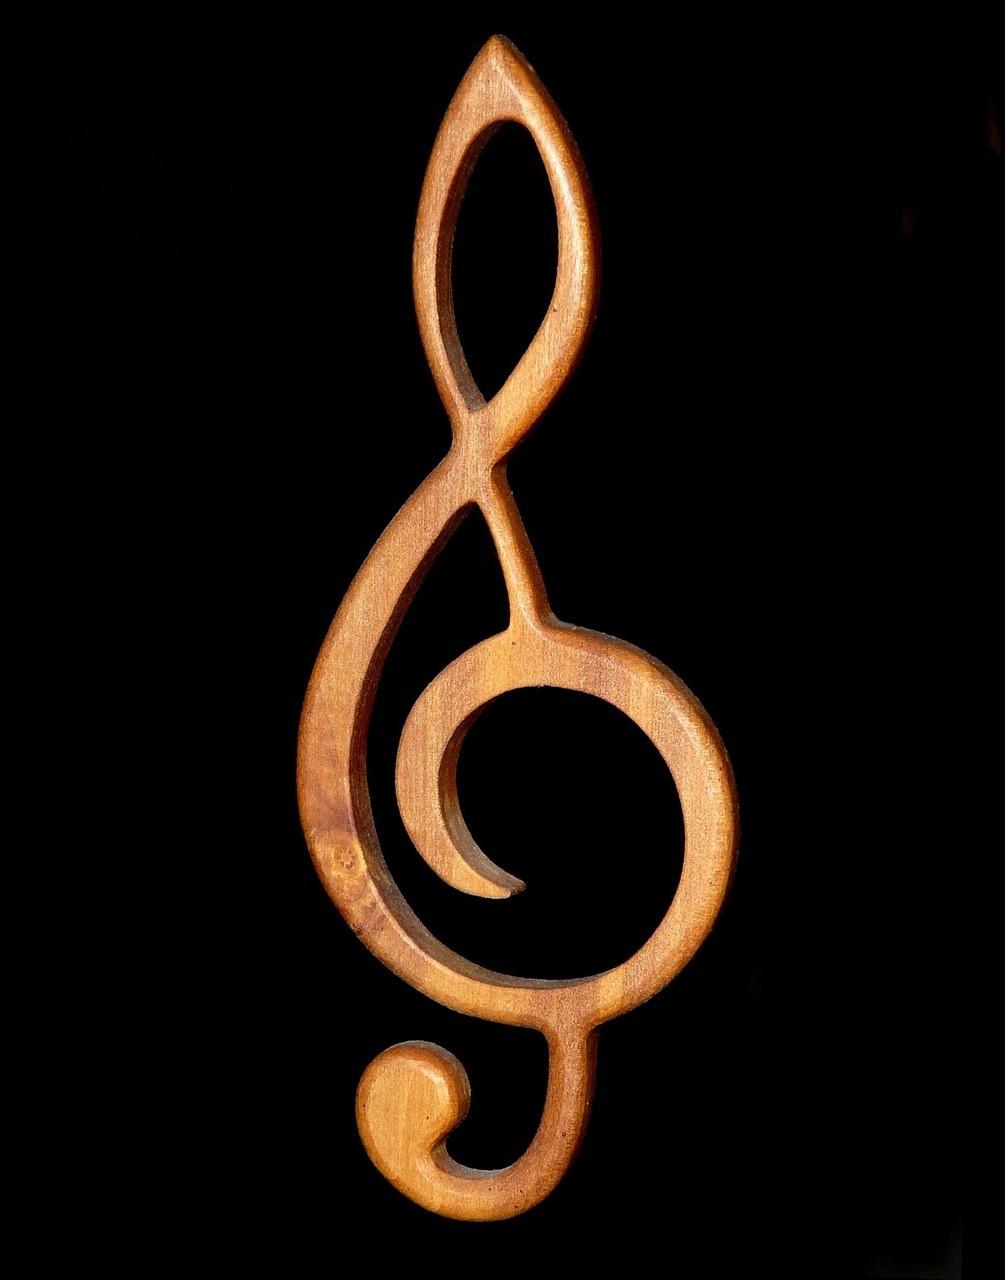 clef-1925129_1280